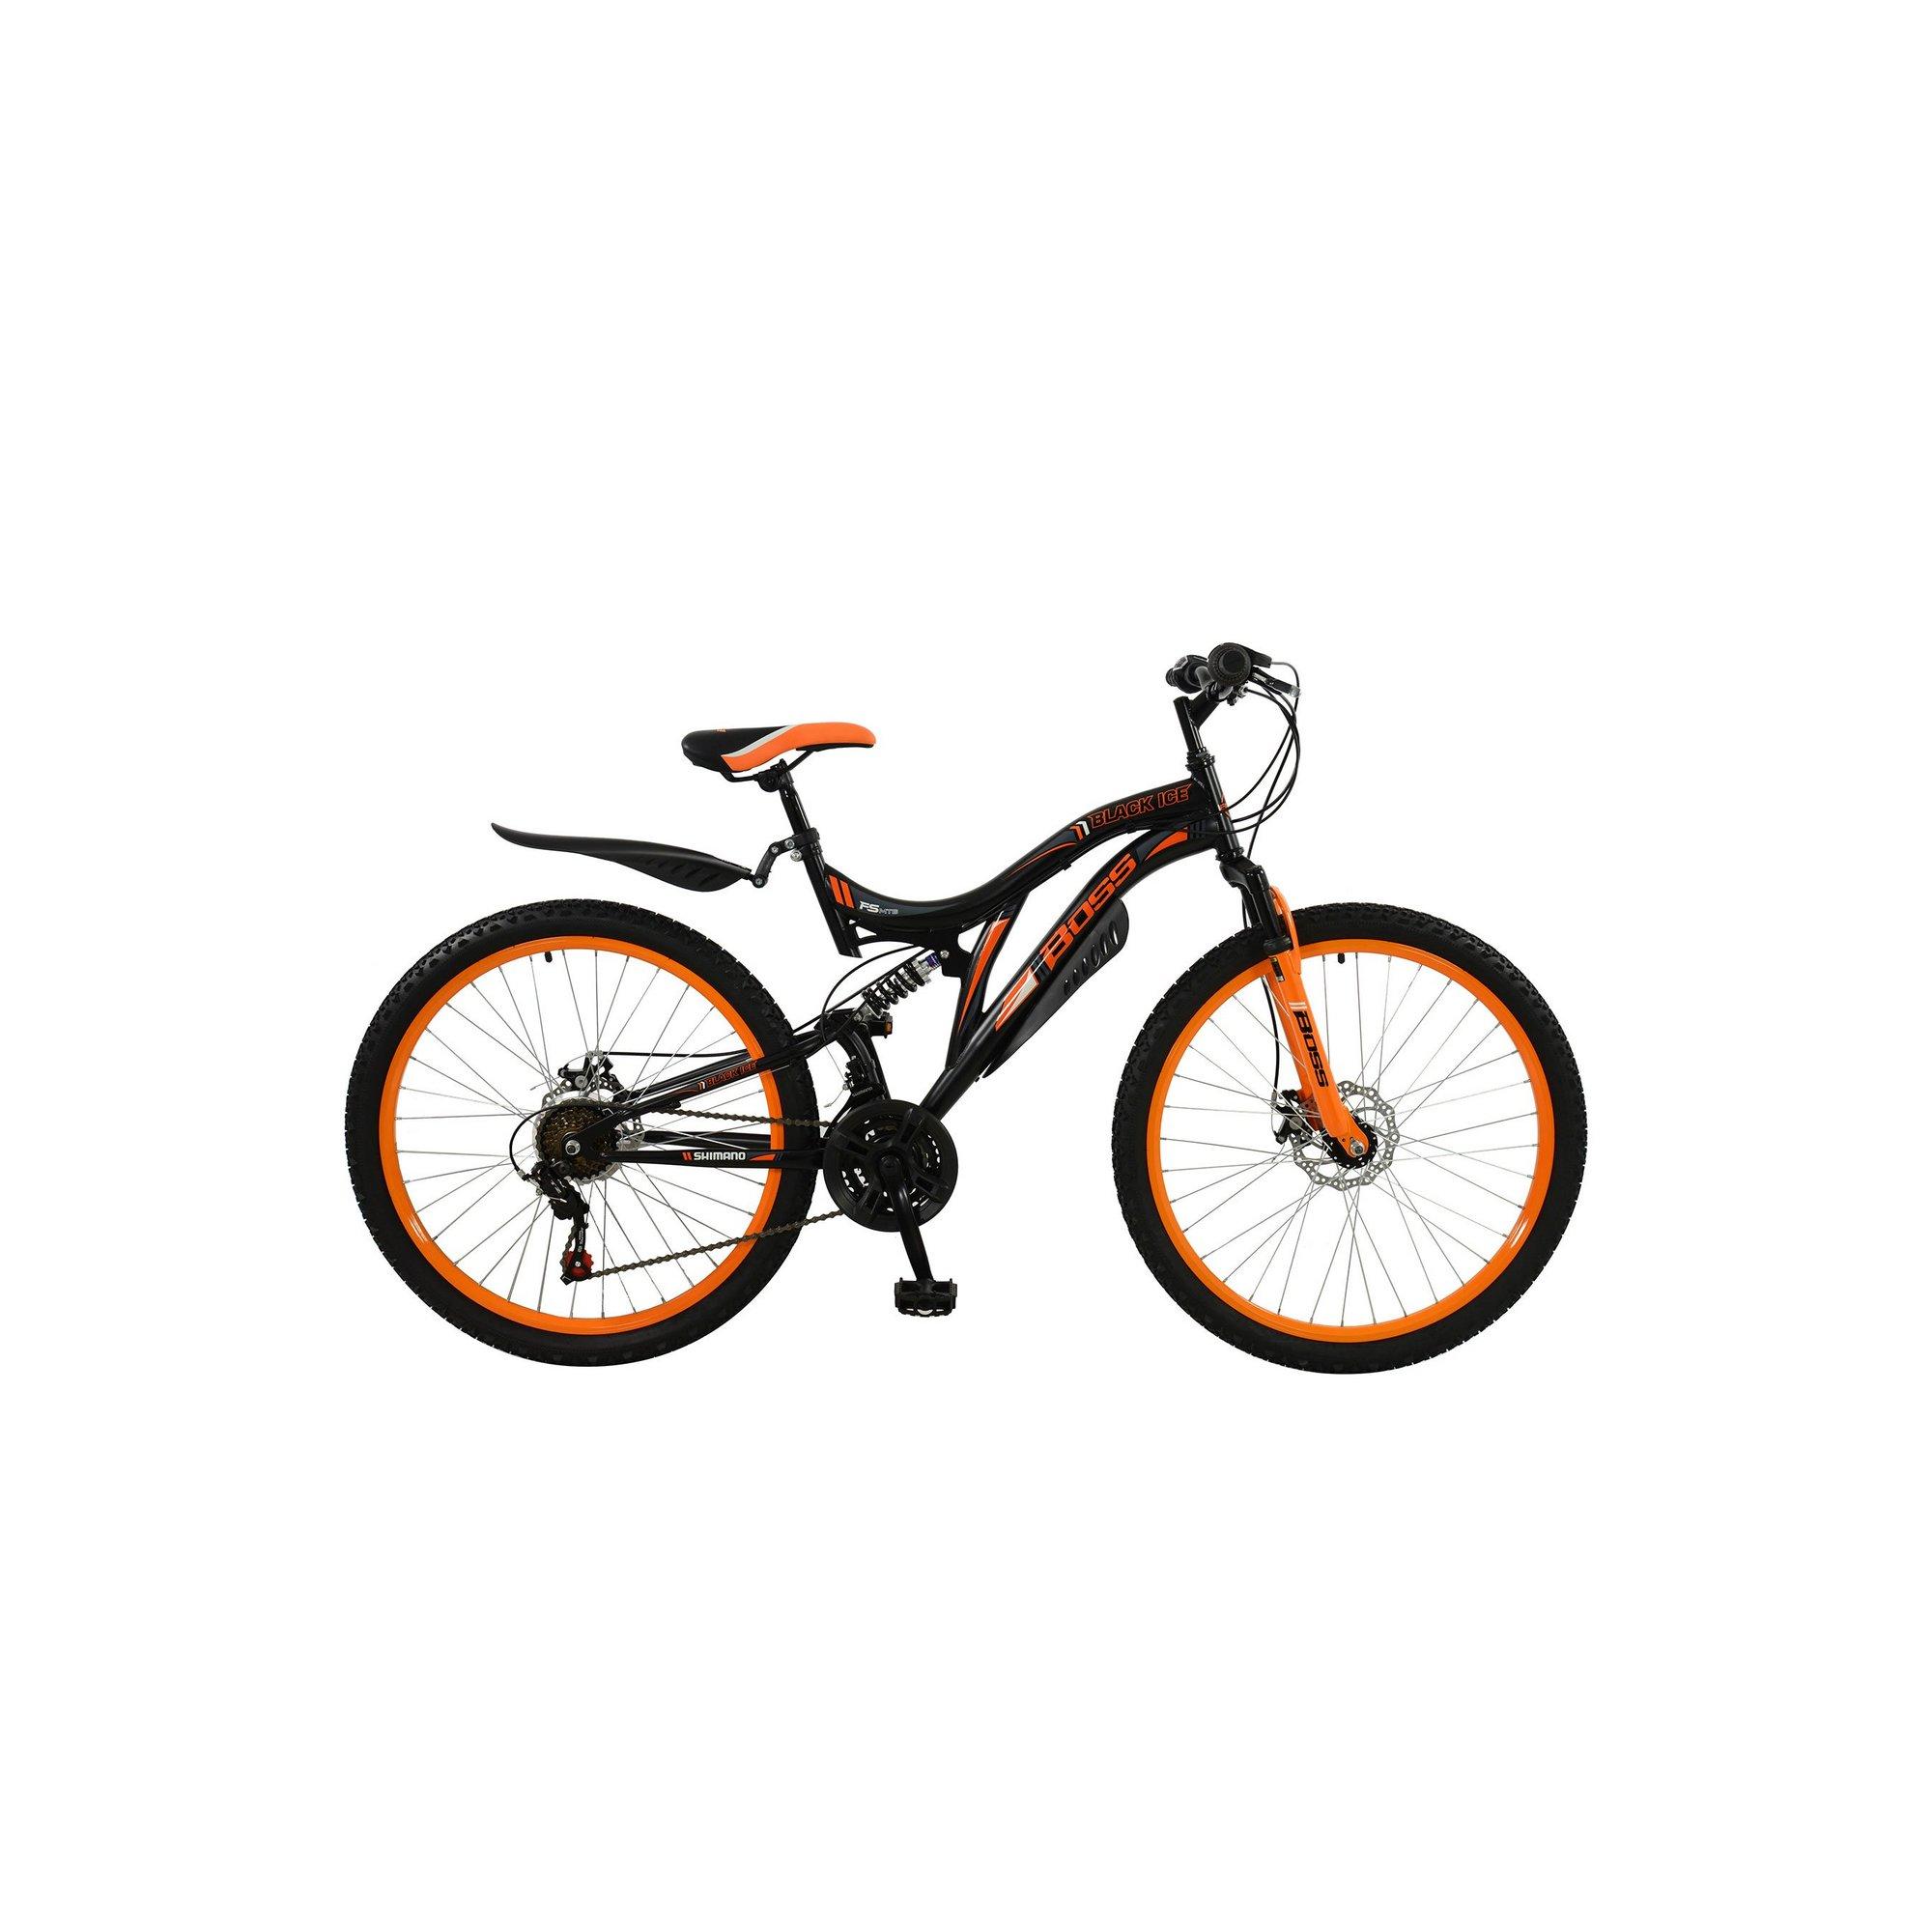 Image of Boss Black Ice 18 Inch Bike